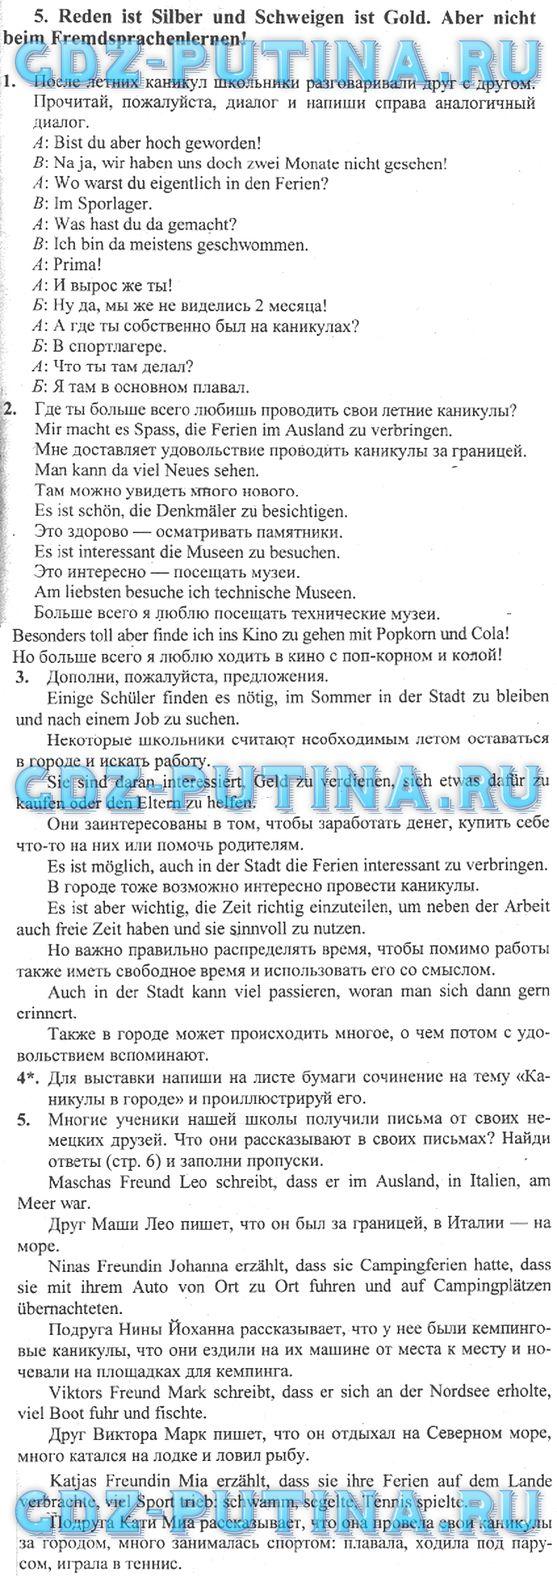 Ab немецкий язык 8 класс бим садомова крылова гдз